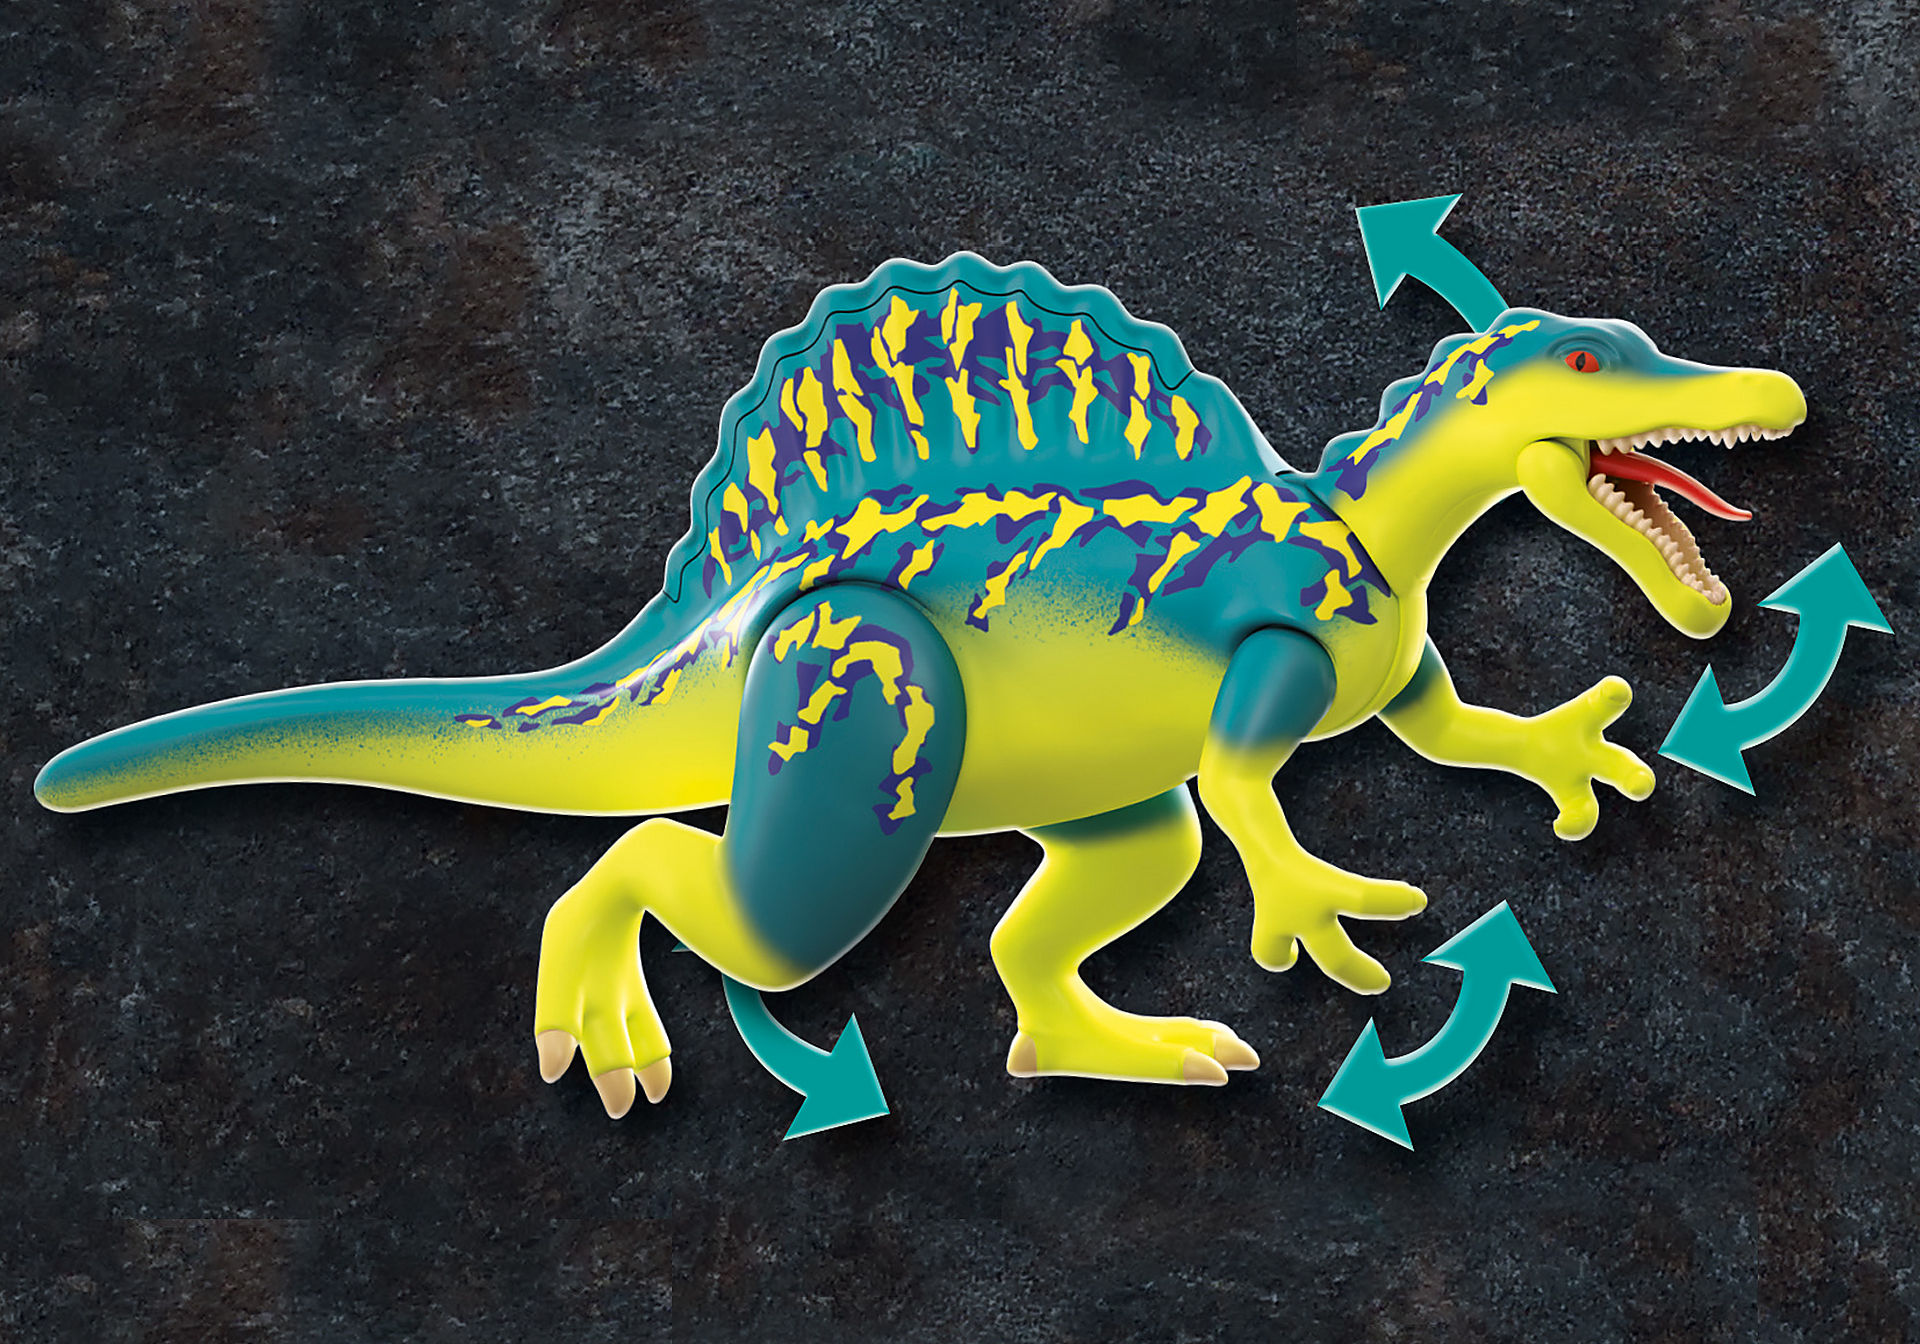 70625 Spinosaurus: Doppelte Verteidigungs-Power zoom image5